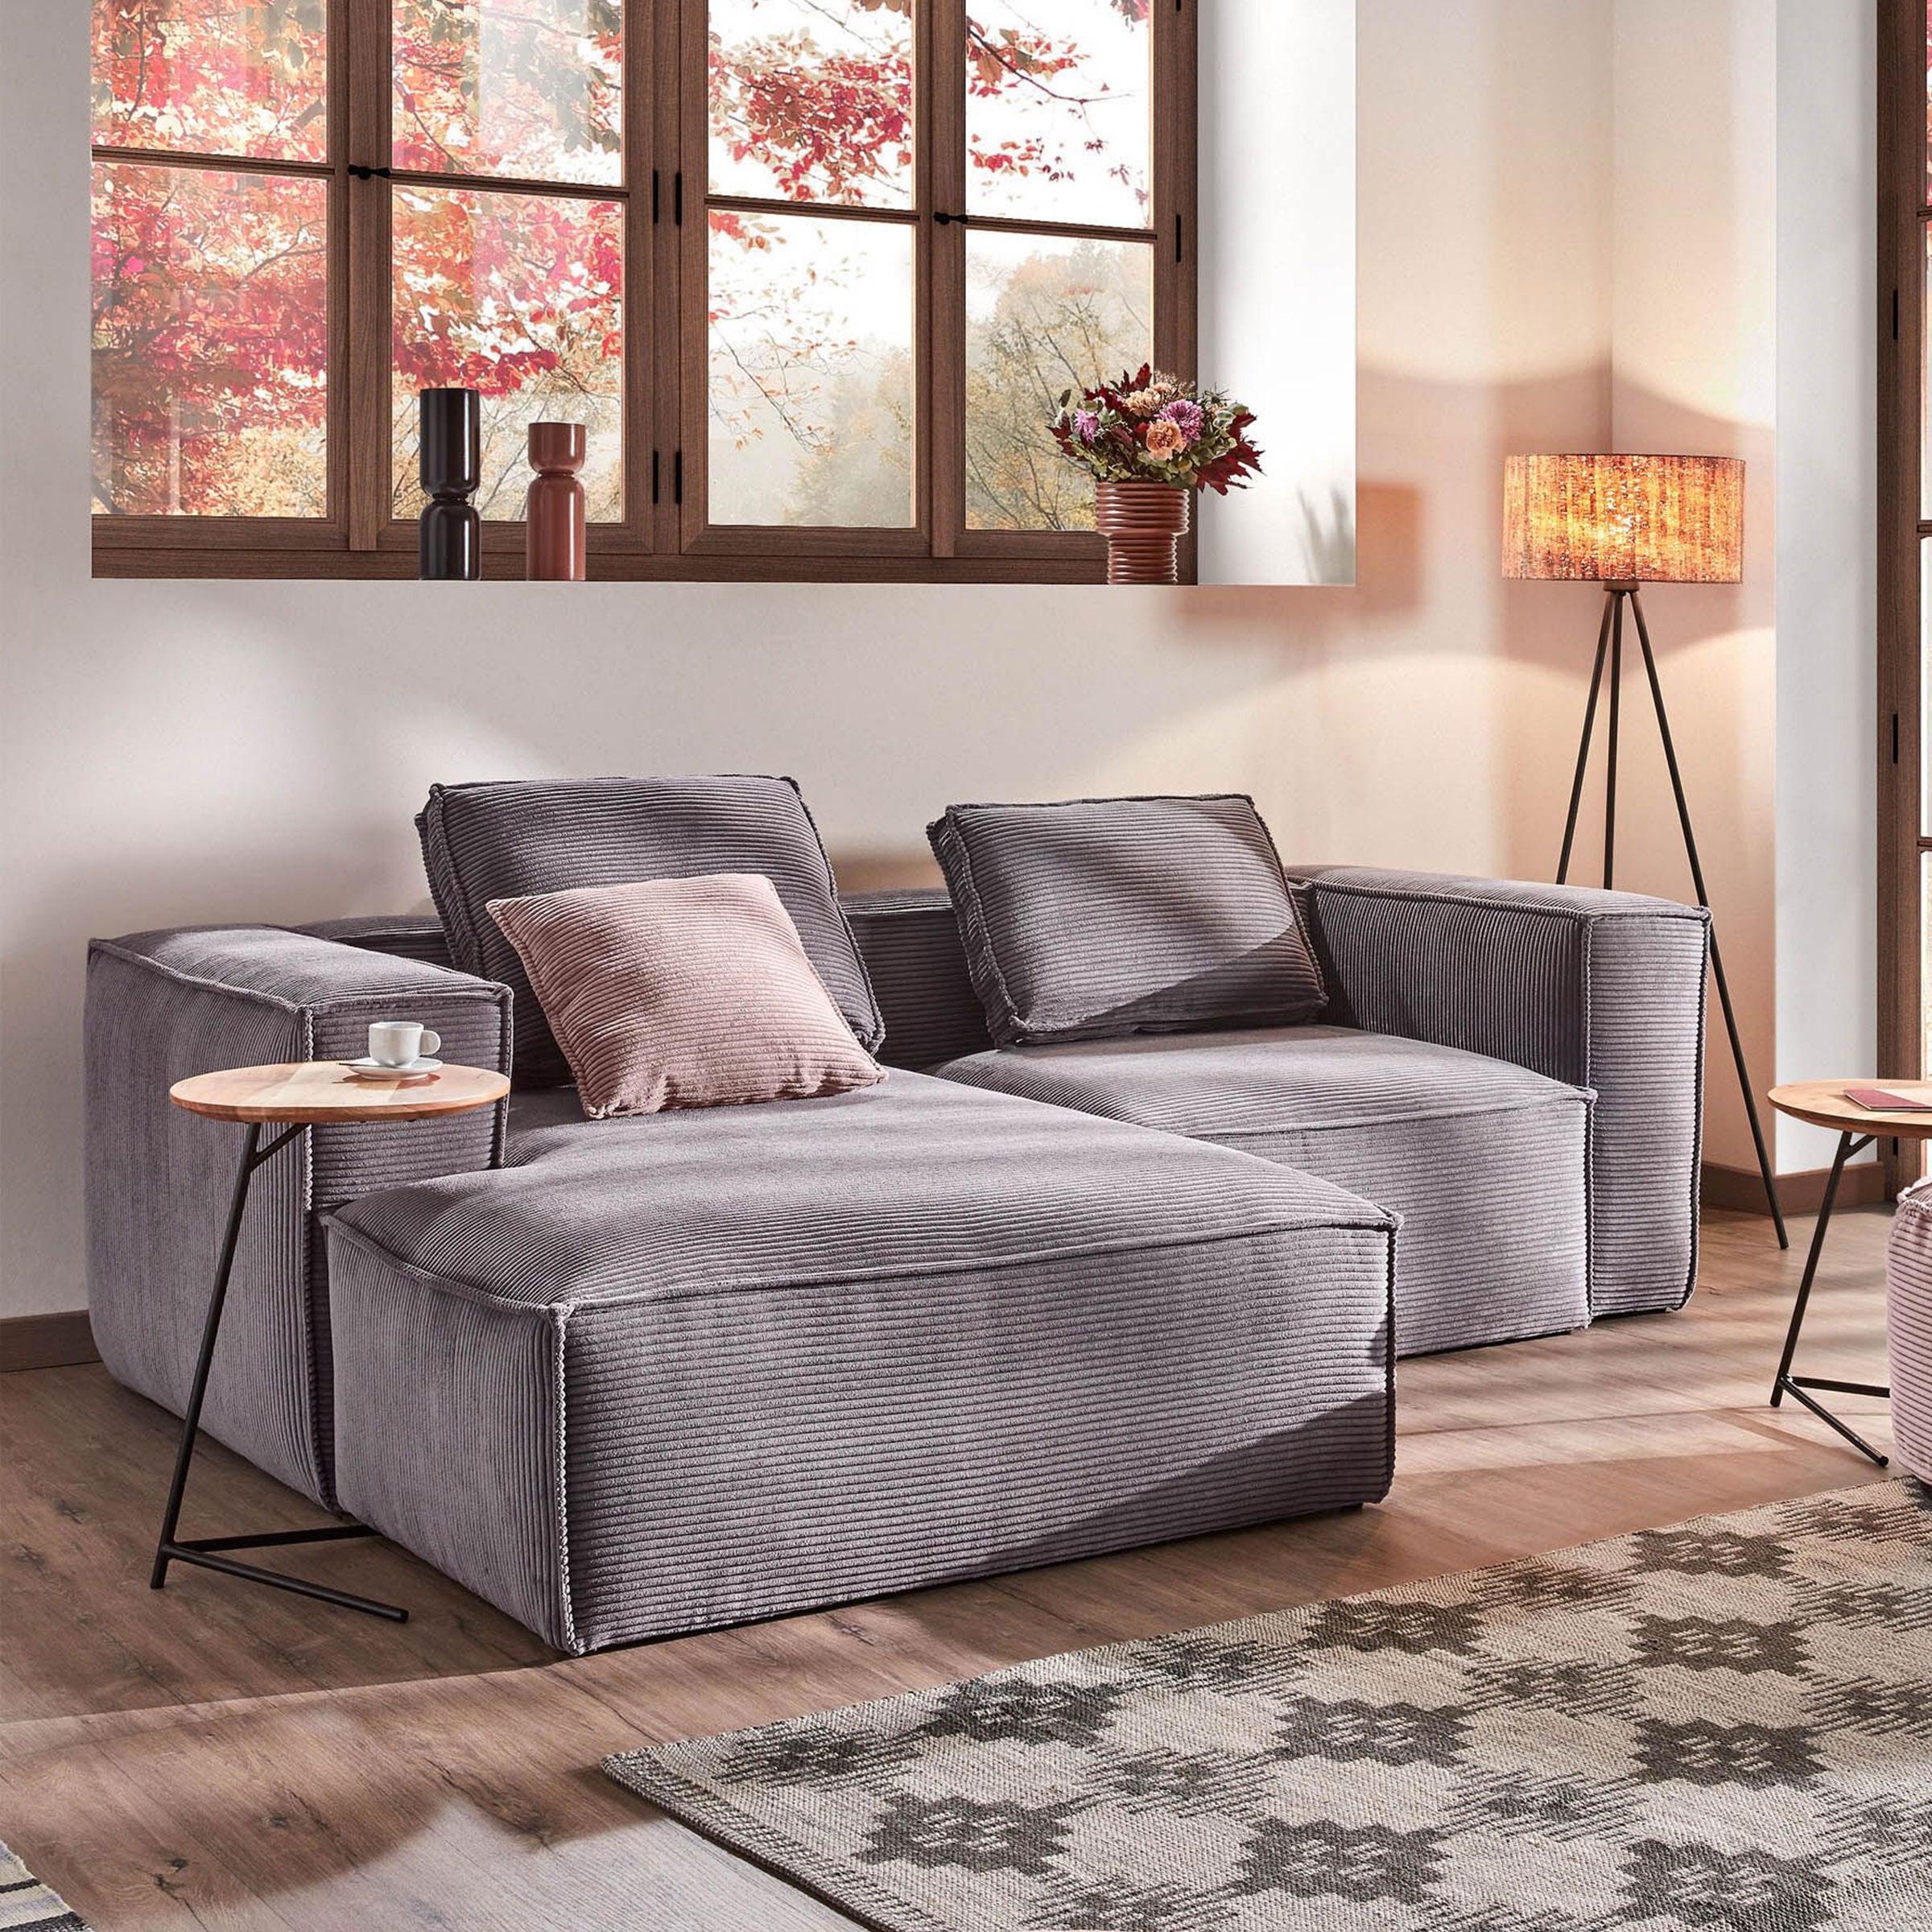 Kave Home Loungebank 'Blok' Rib, Links 240cm, kleur Donkergrijs